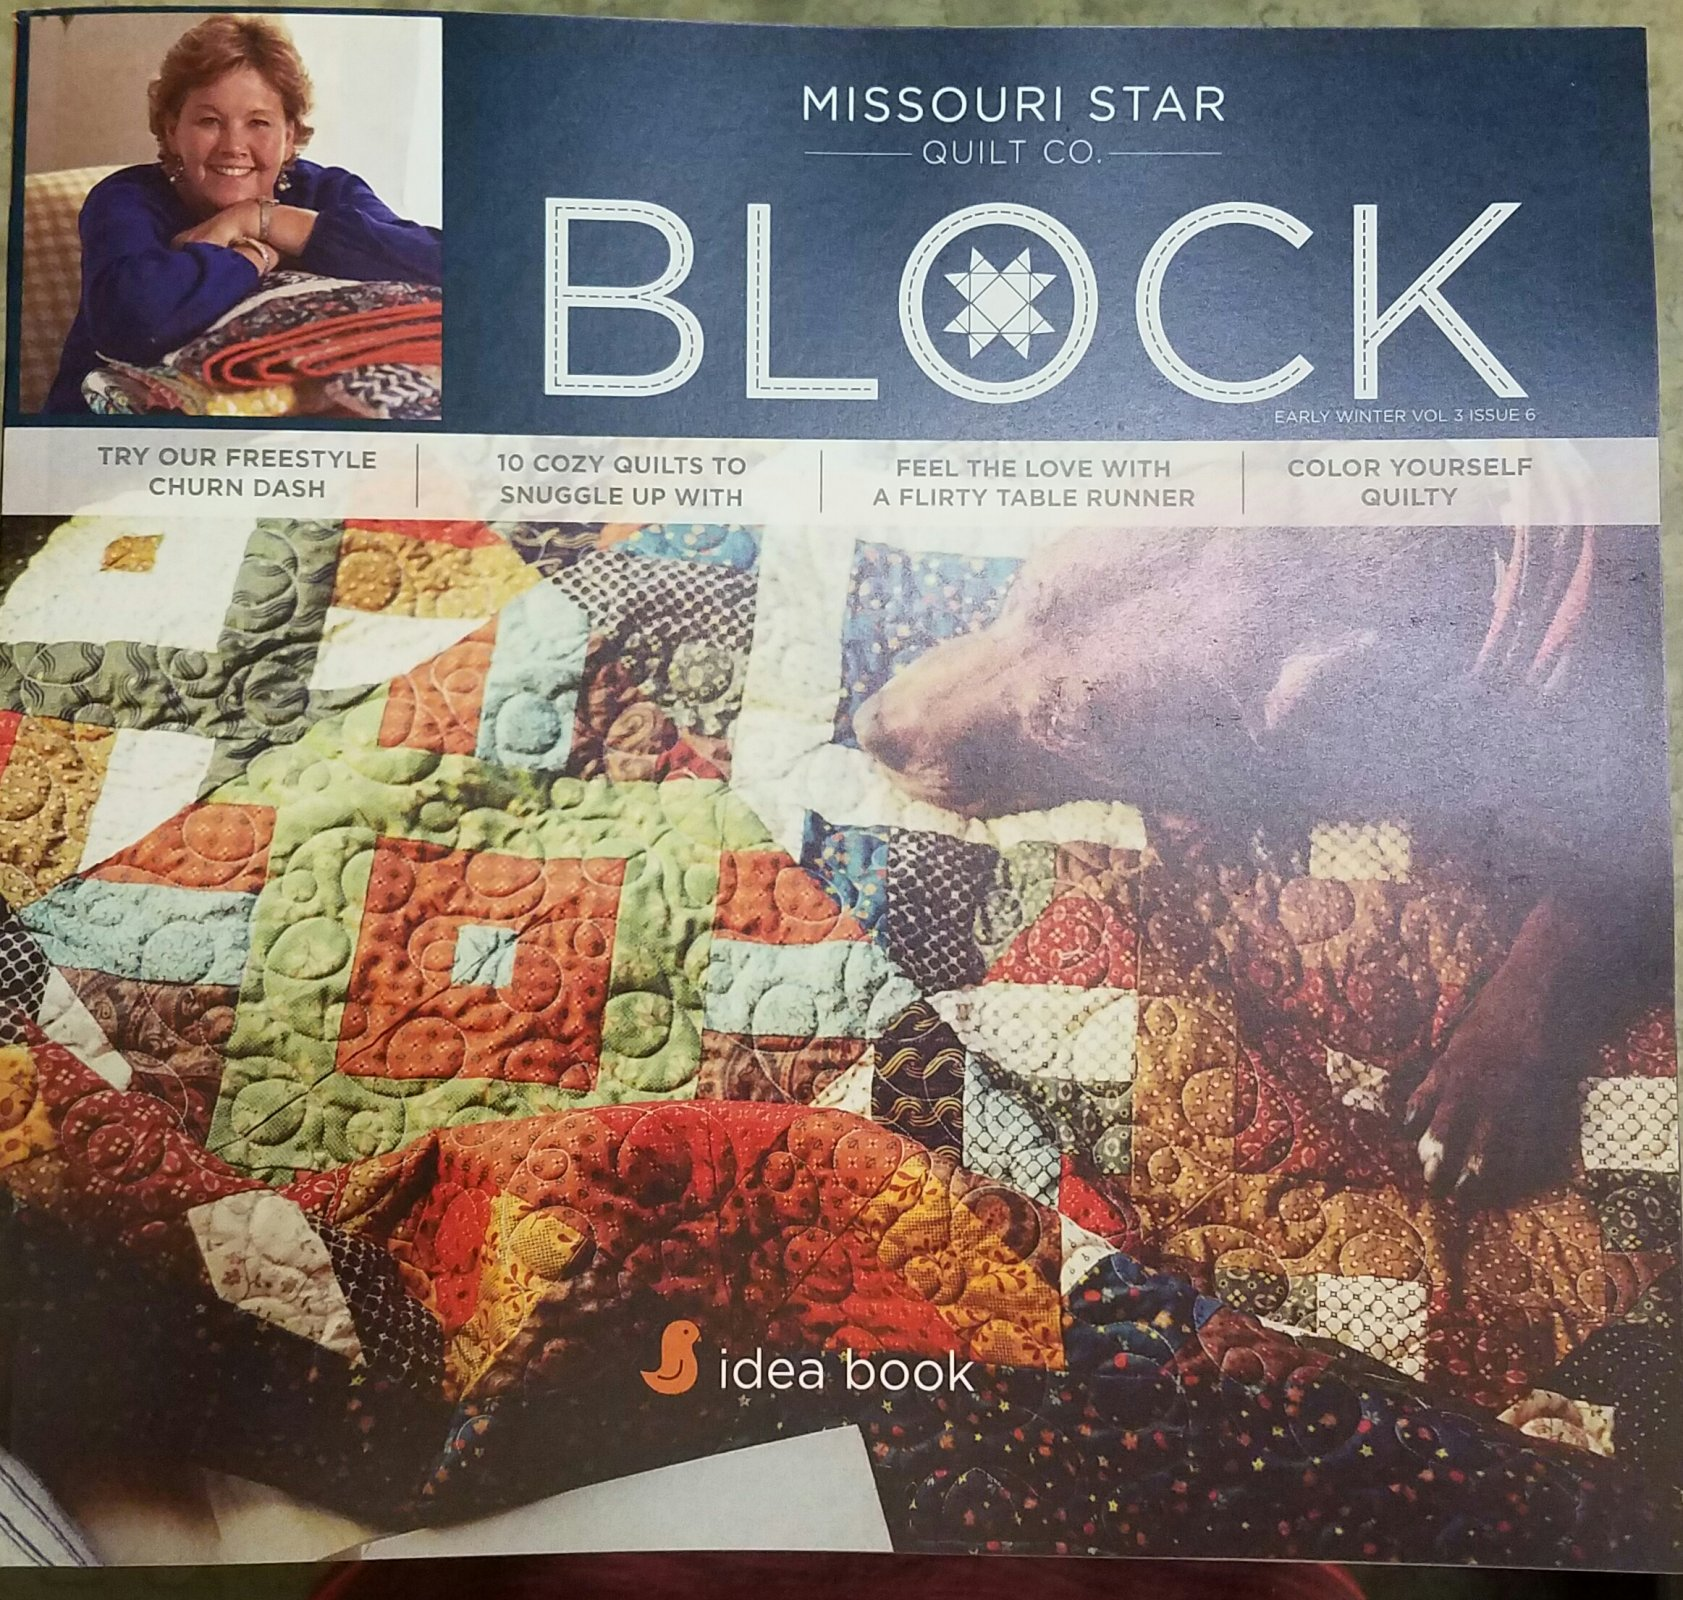 Missouri Star Block Idea Book Early Winter 2017